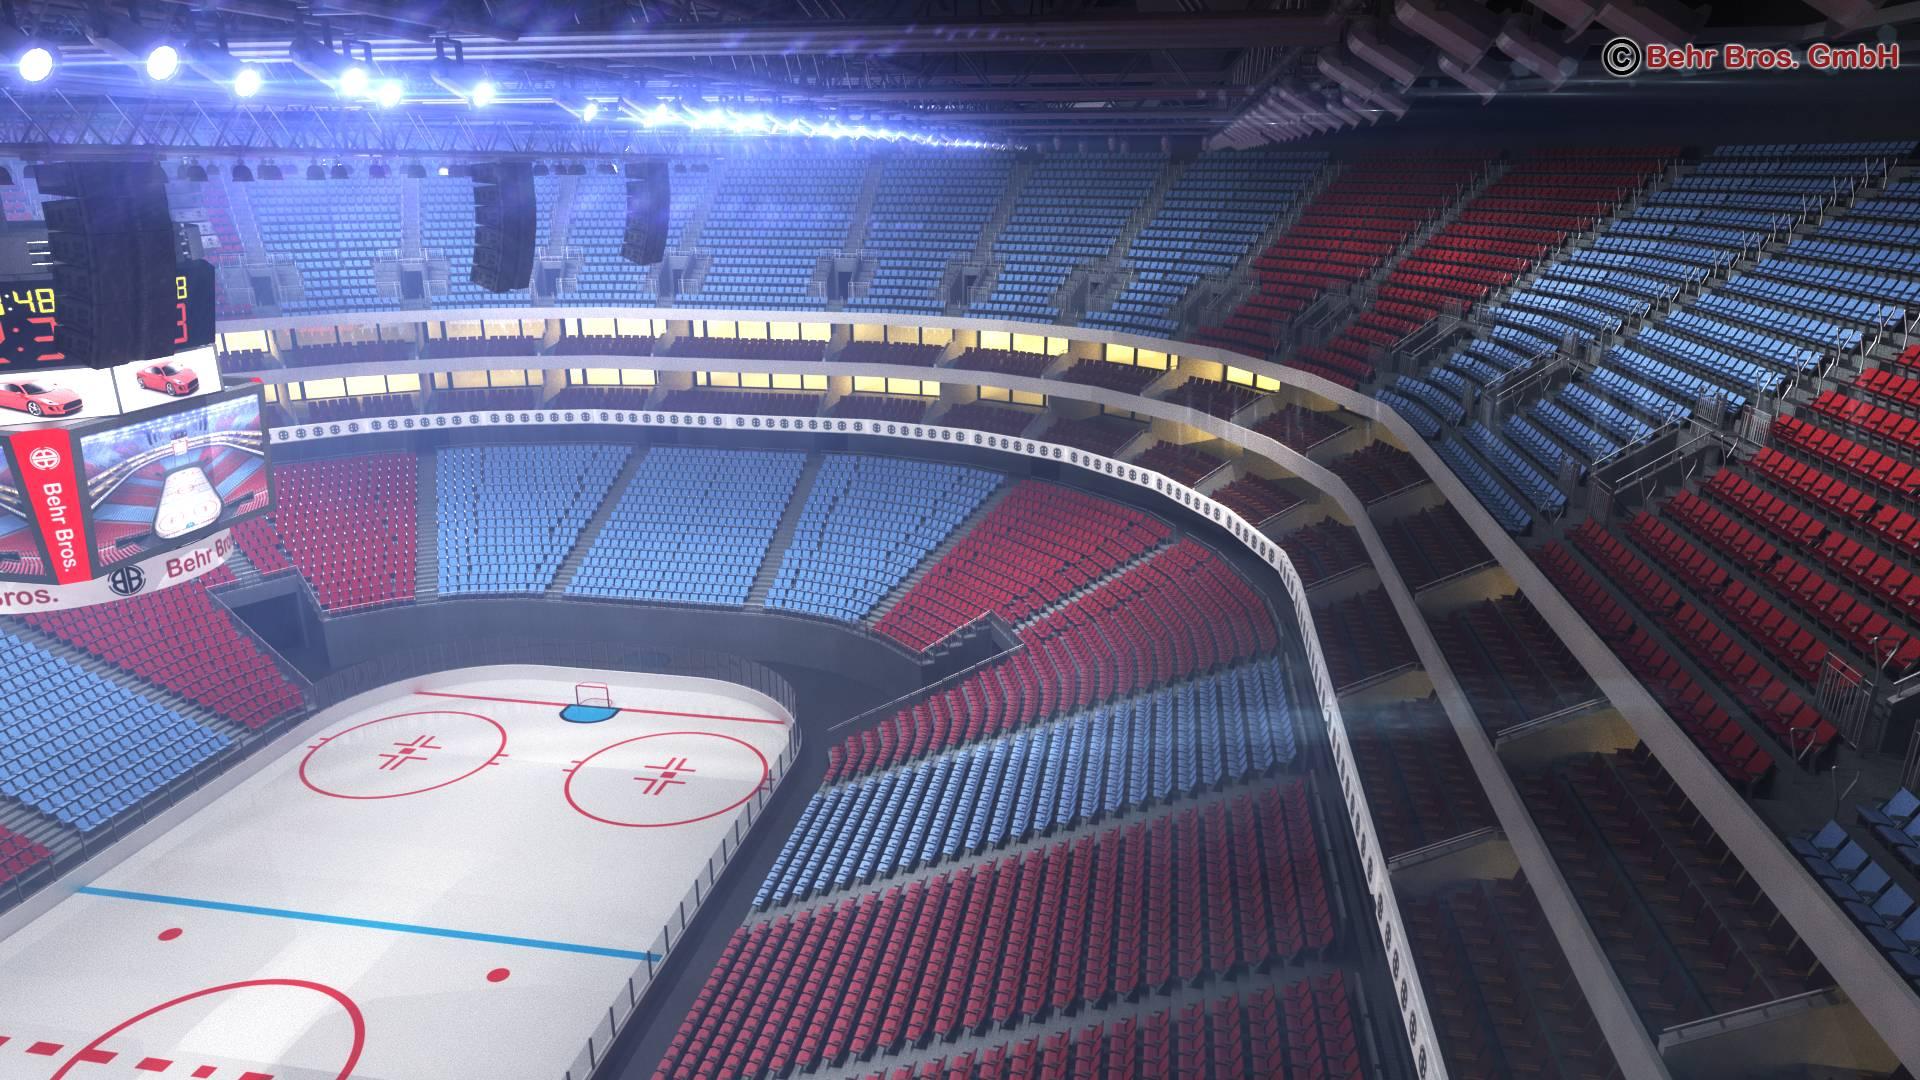 ice hockey arena v2 3d model 3ds max fbx c4d lwo ma mb obj 251657